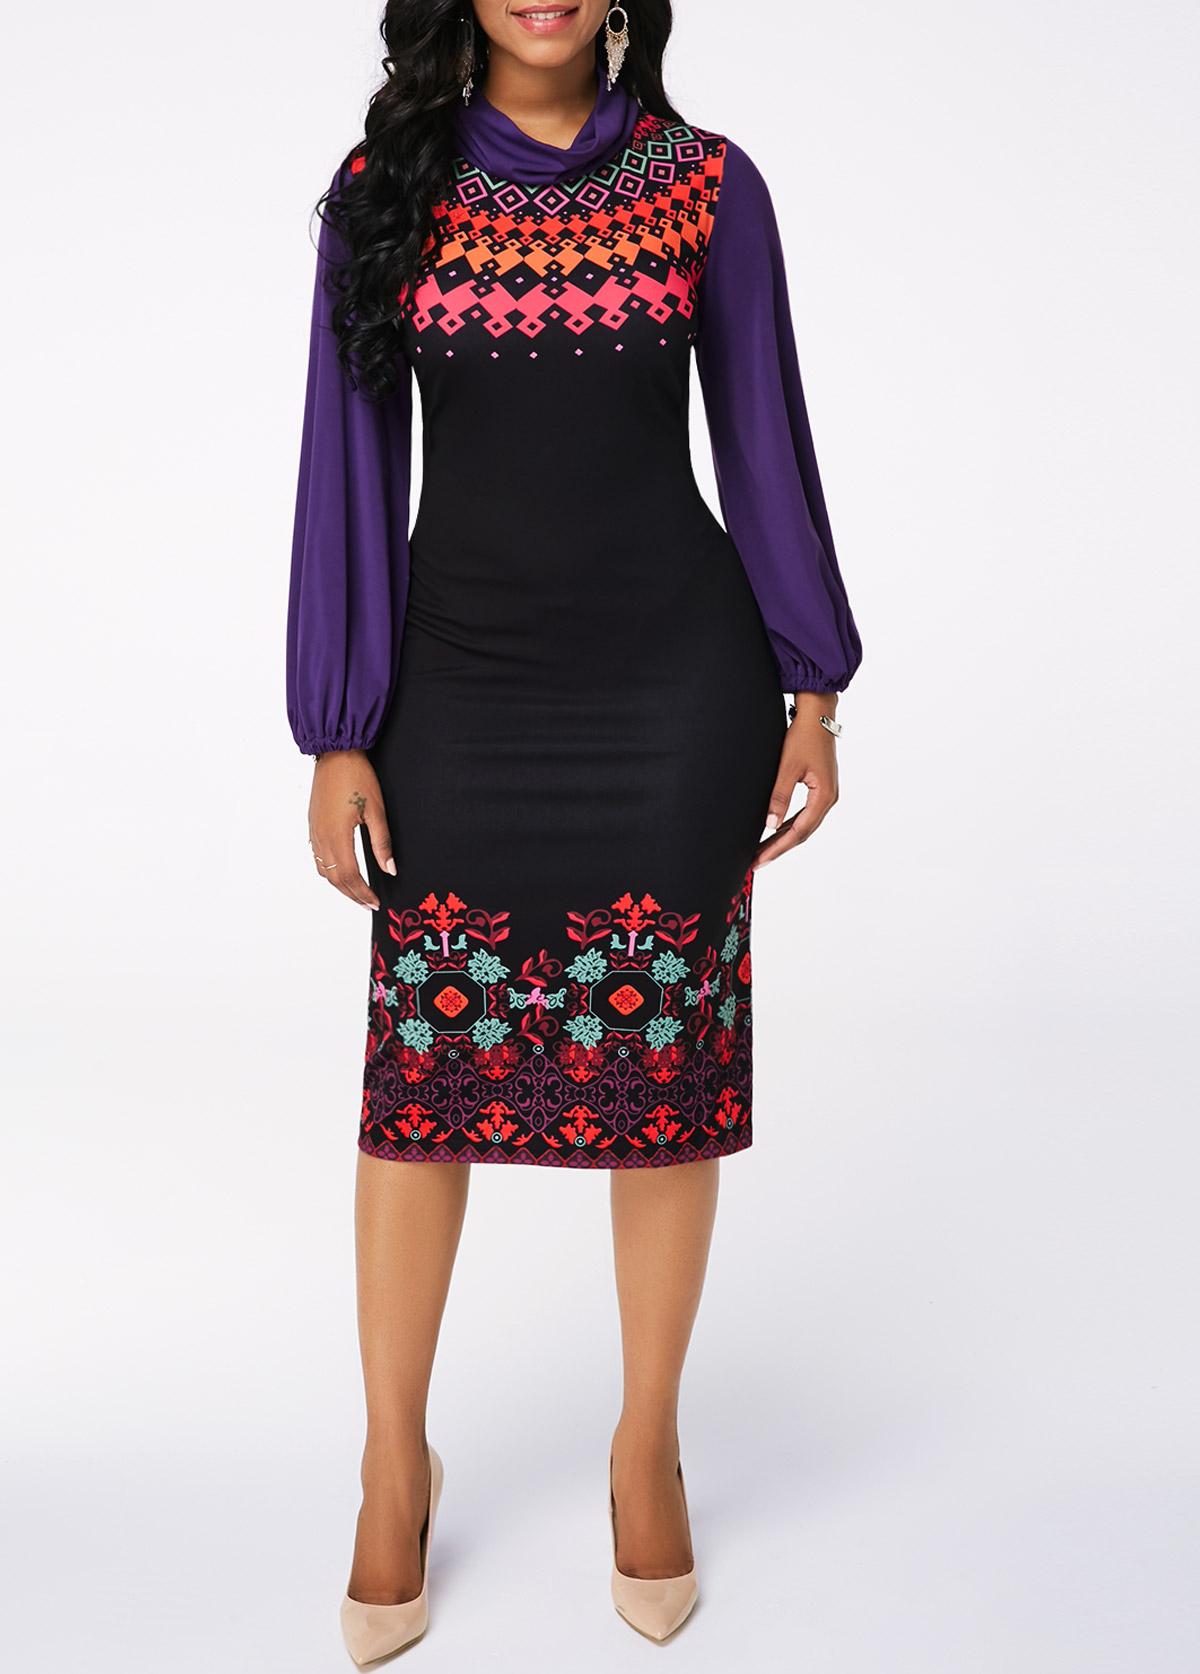 Lantern Sleeve Printed Black Sheath Dress